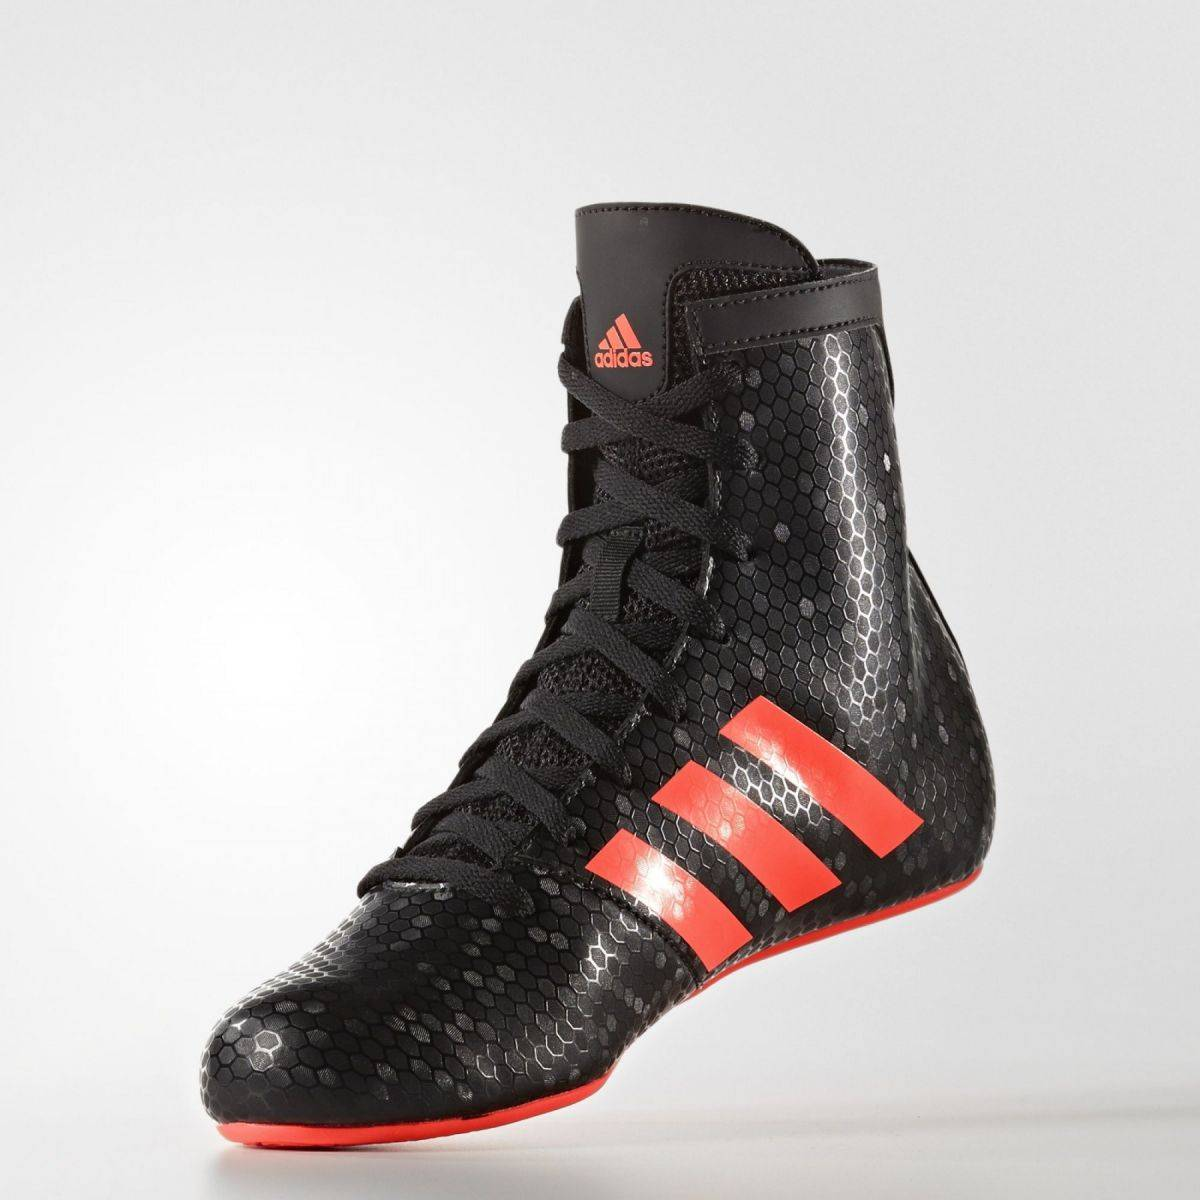 Детские боксерки Adidas KO Legend 16.2 Kids